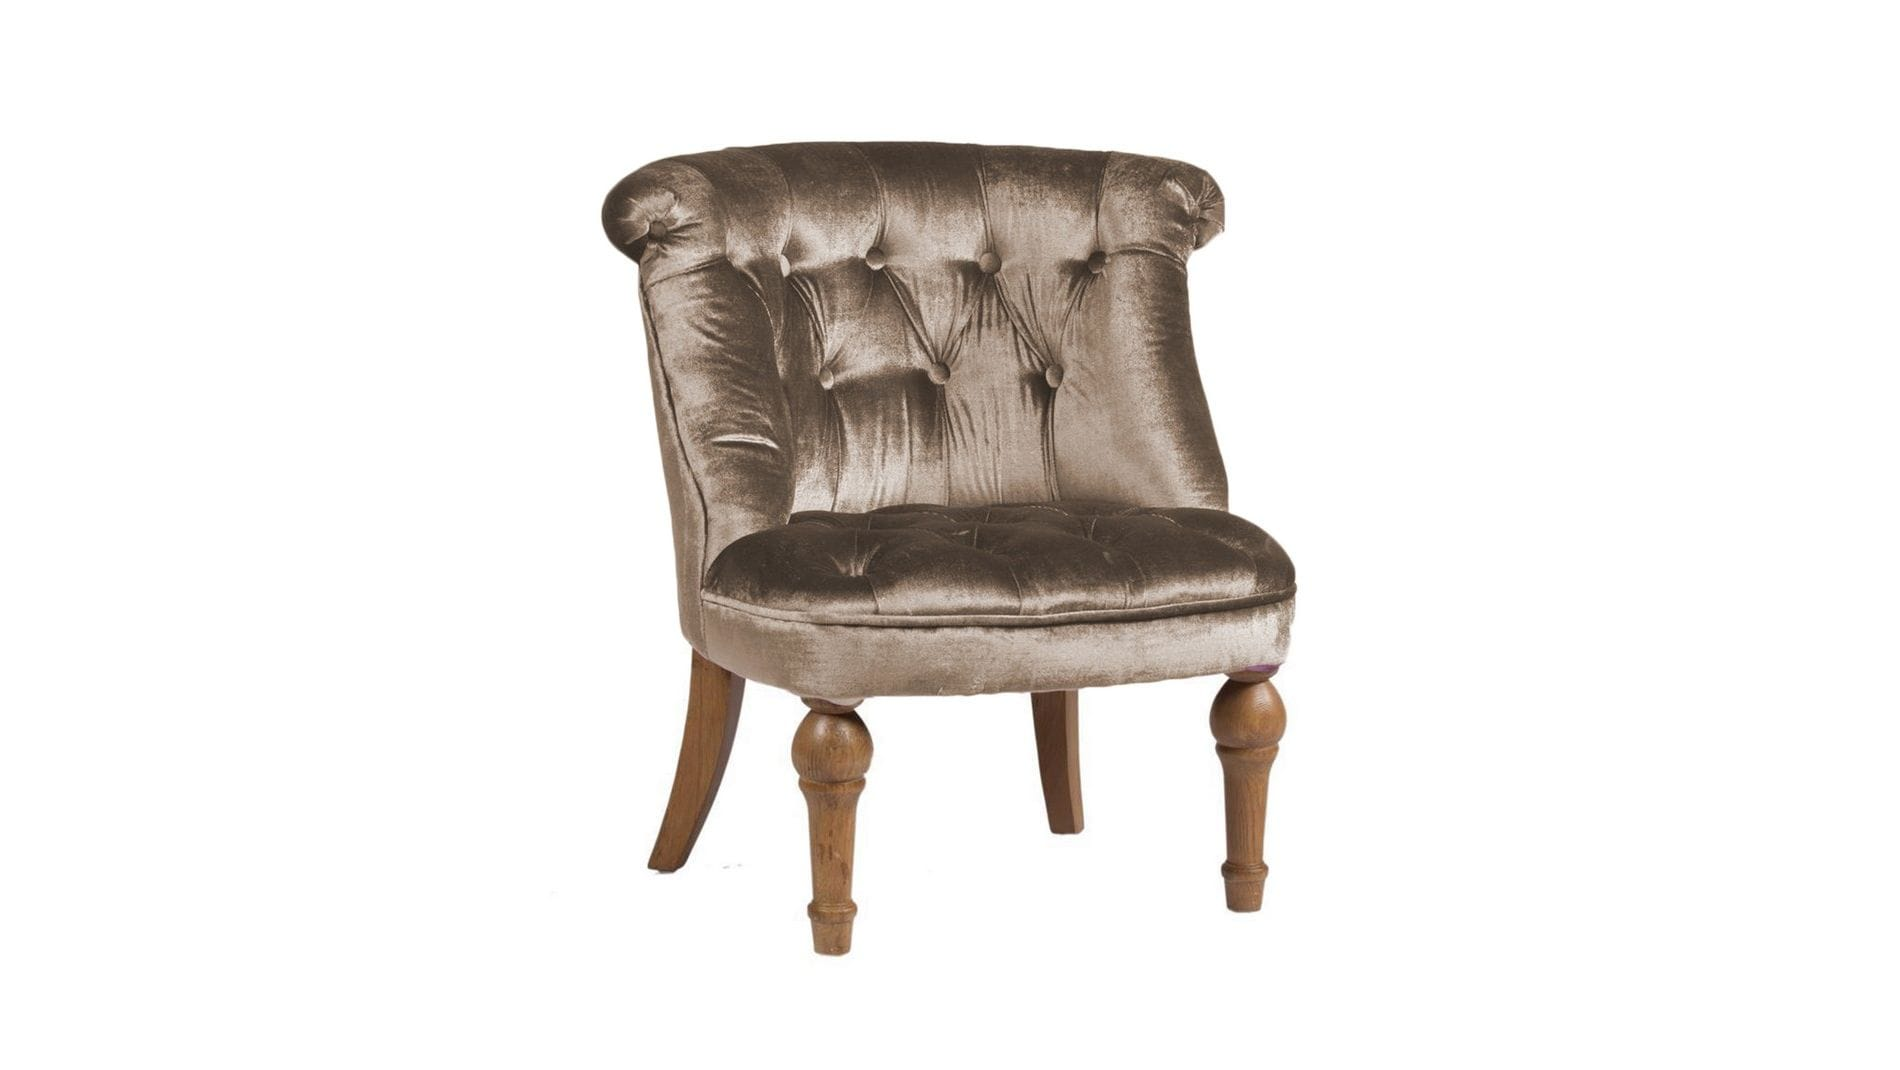 Кресло Sophie Tufted Slipper Chair Серо-Коричневый Микровелюр М